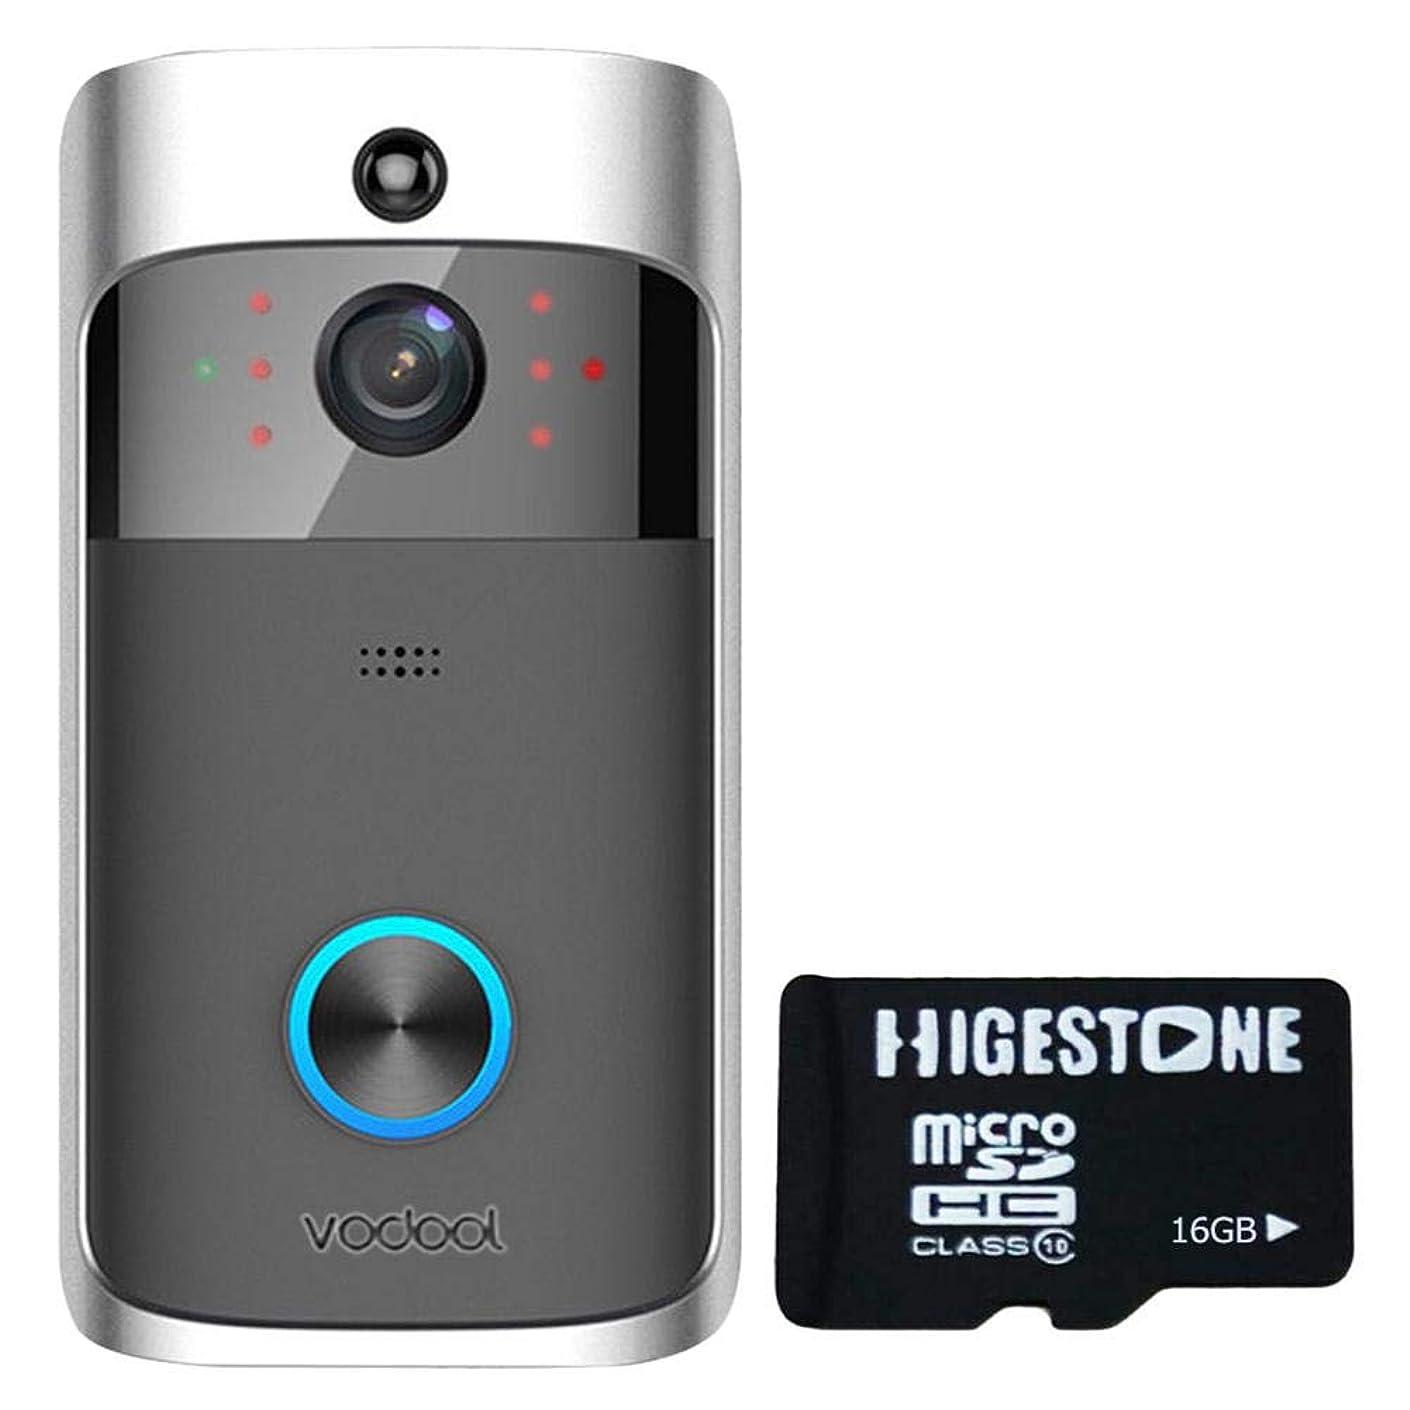 Widewing Vodool V5 Smart WiFi Video Doorbell Visual Intercom with 16GB Card (Grey)